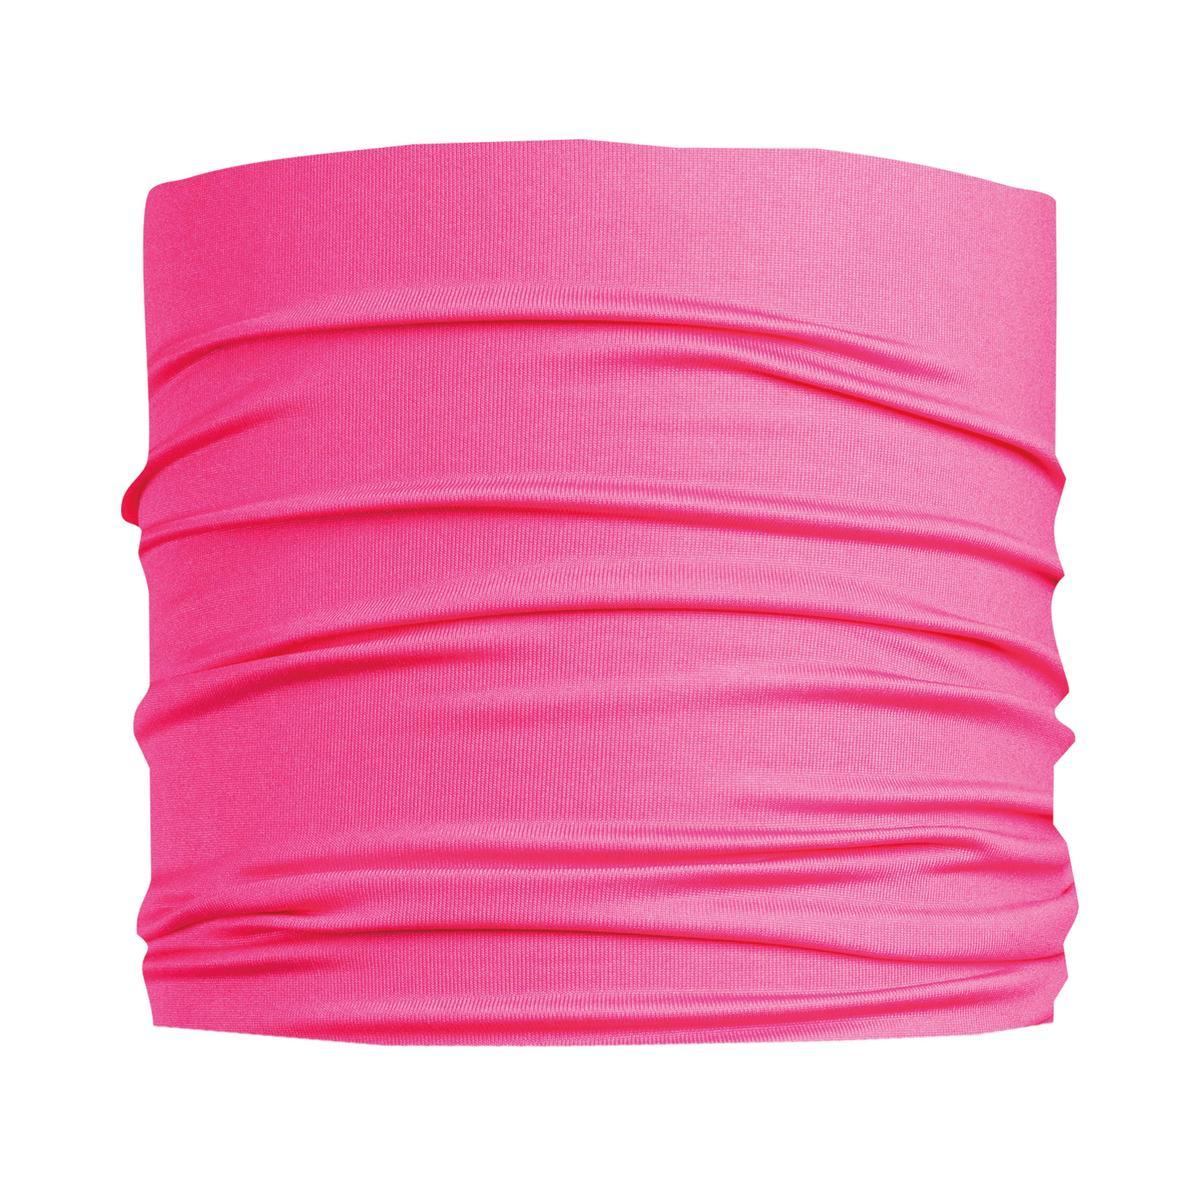 Turtle Fur Ultralight Breathable Totally Tubular Upper Half Face Covering Neck Gaiter Hot Pink